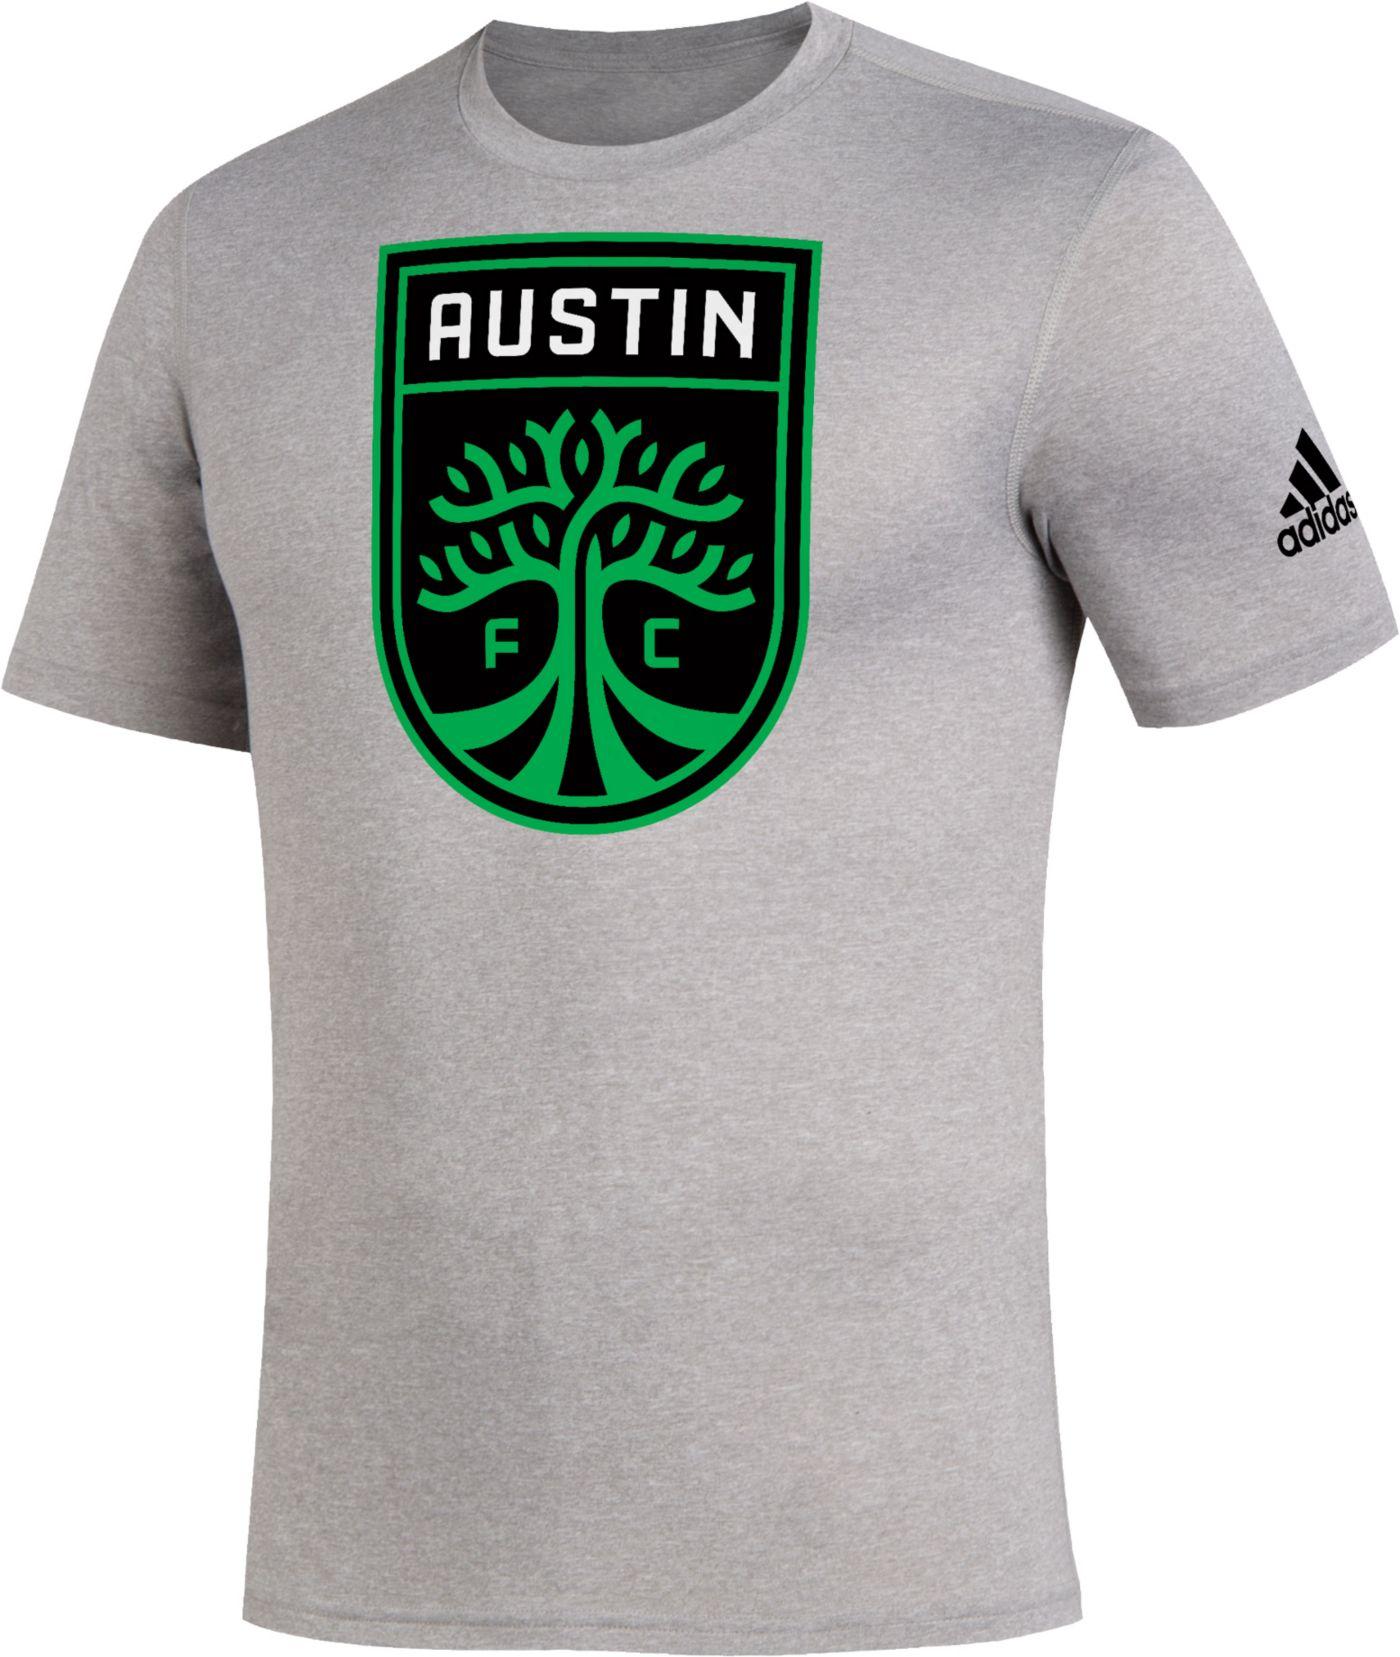 adidas Men's Austin FC Logo Heather Grey T-Shirt